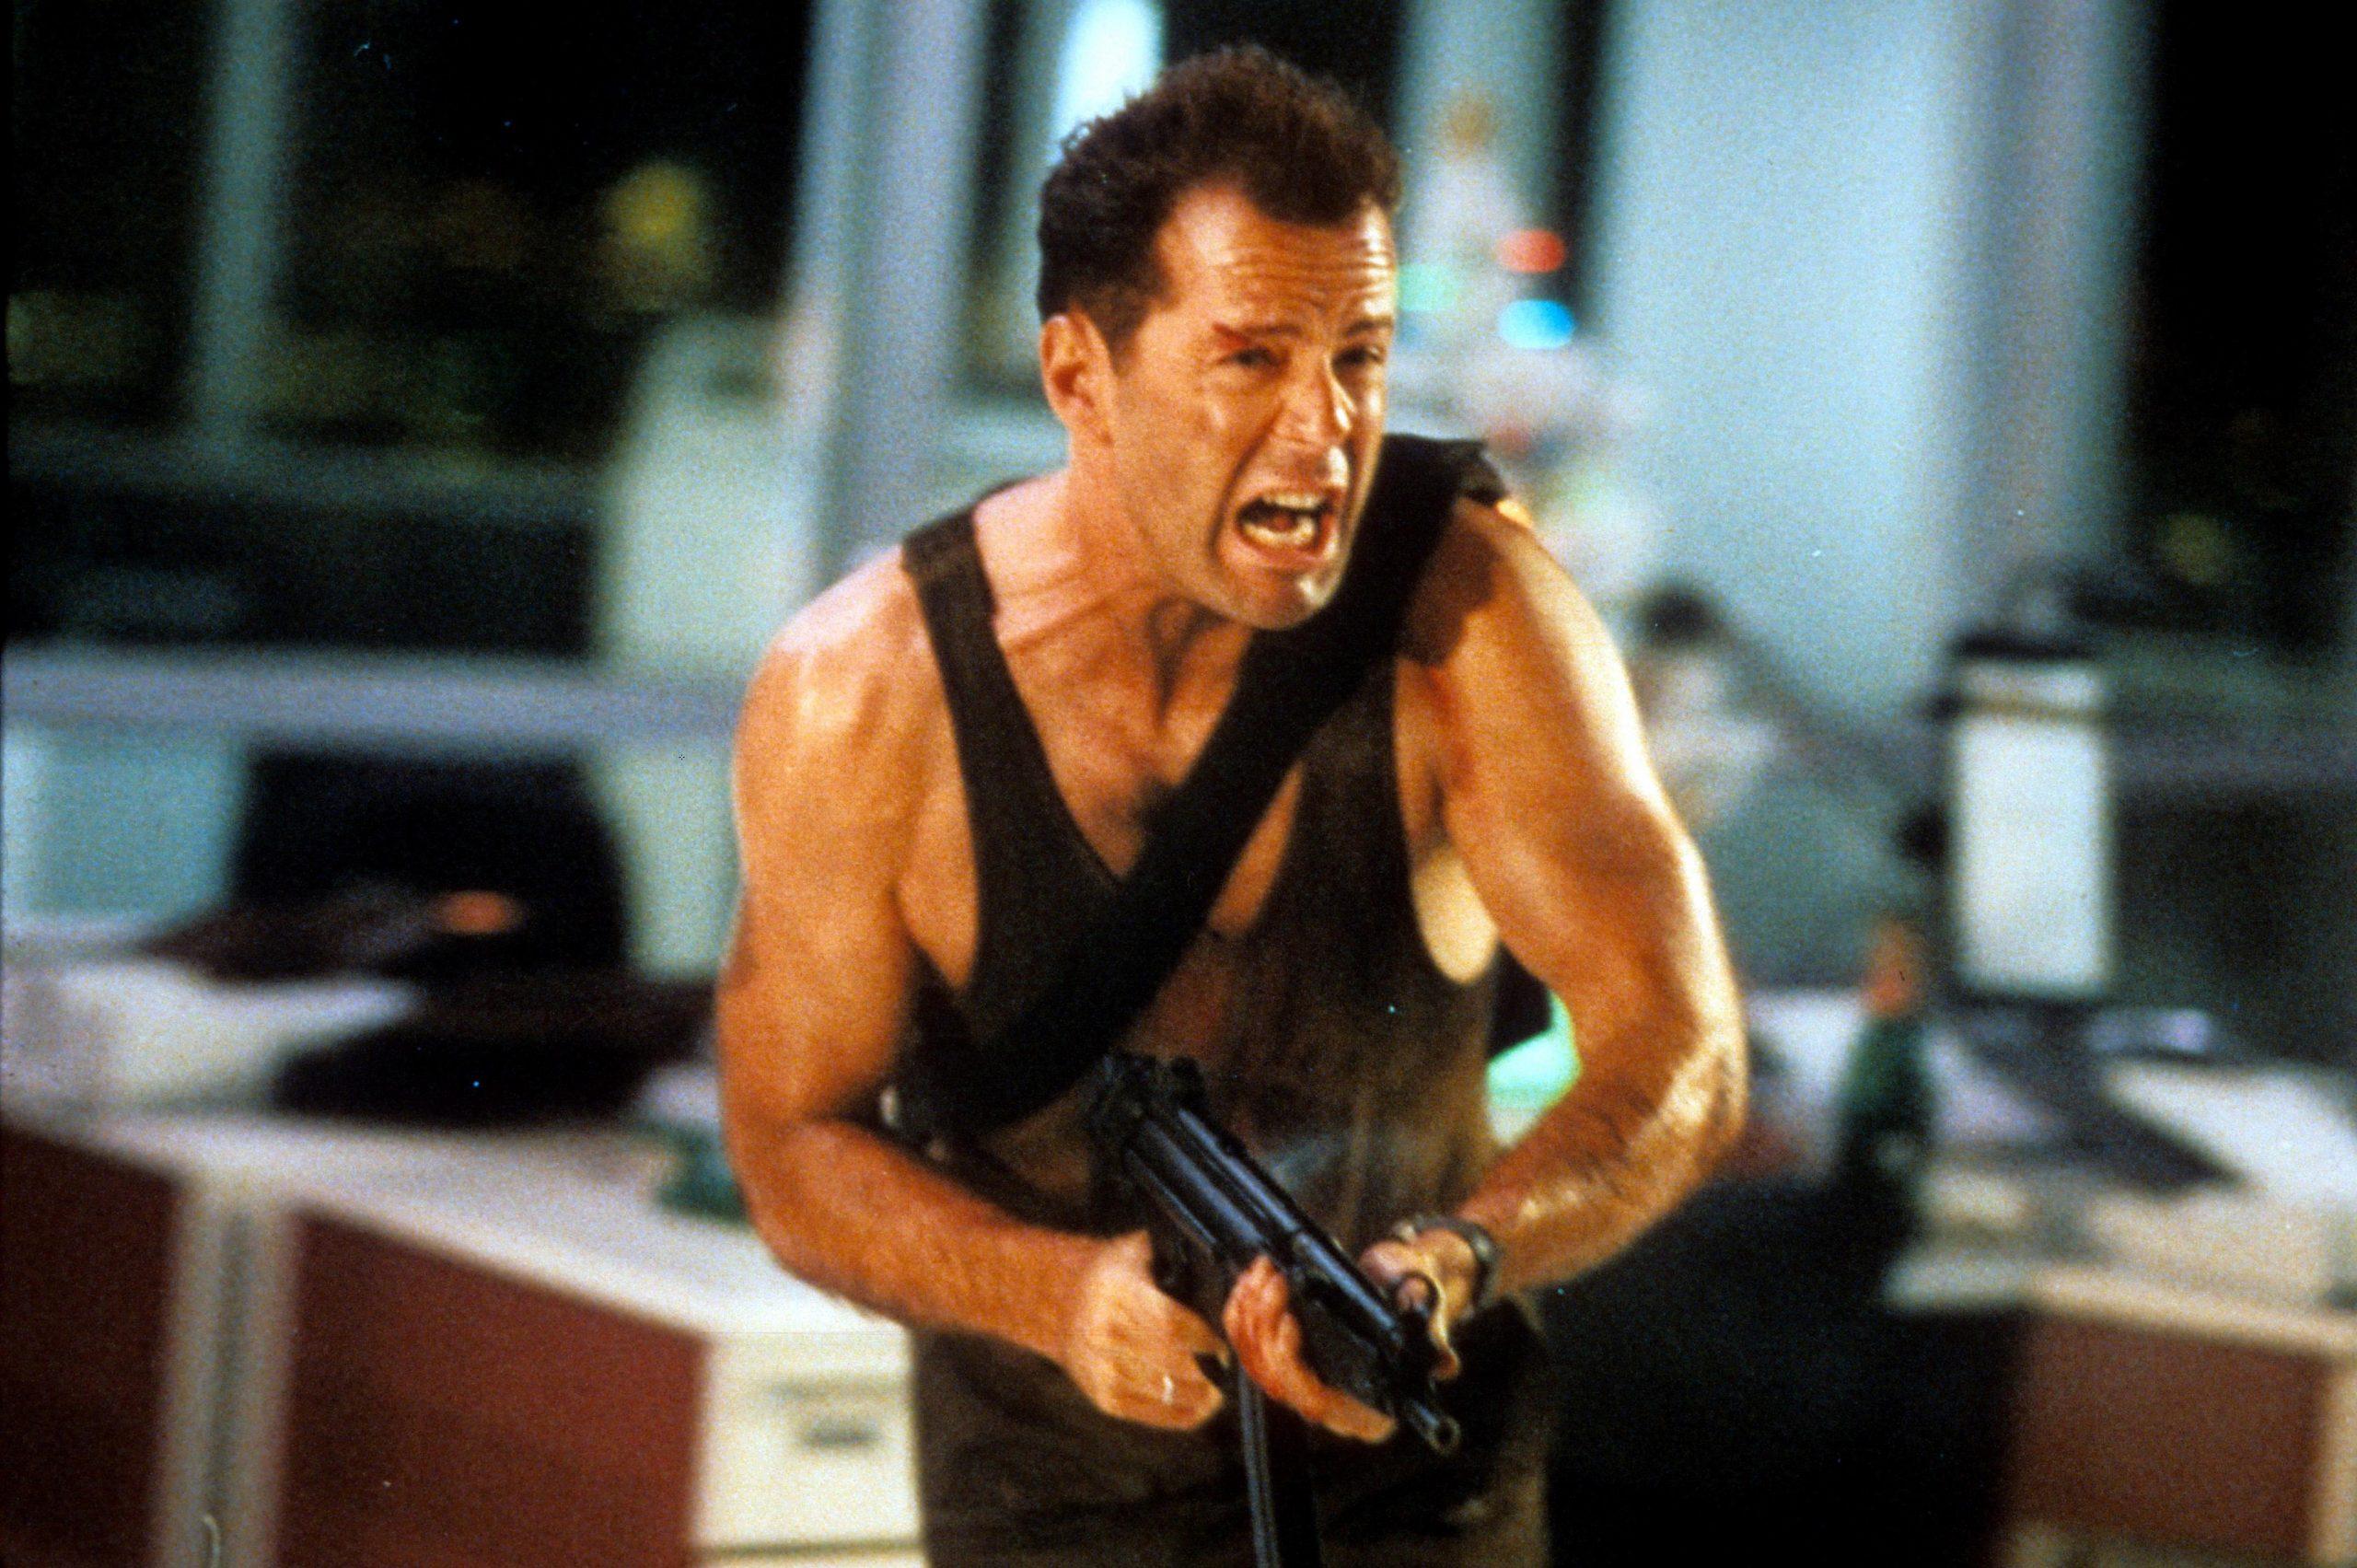 McClane running forward screaming and brandishing a gun